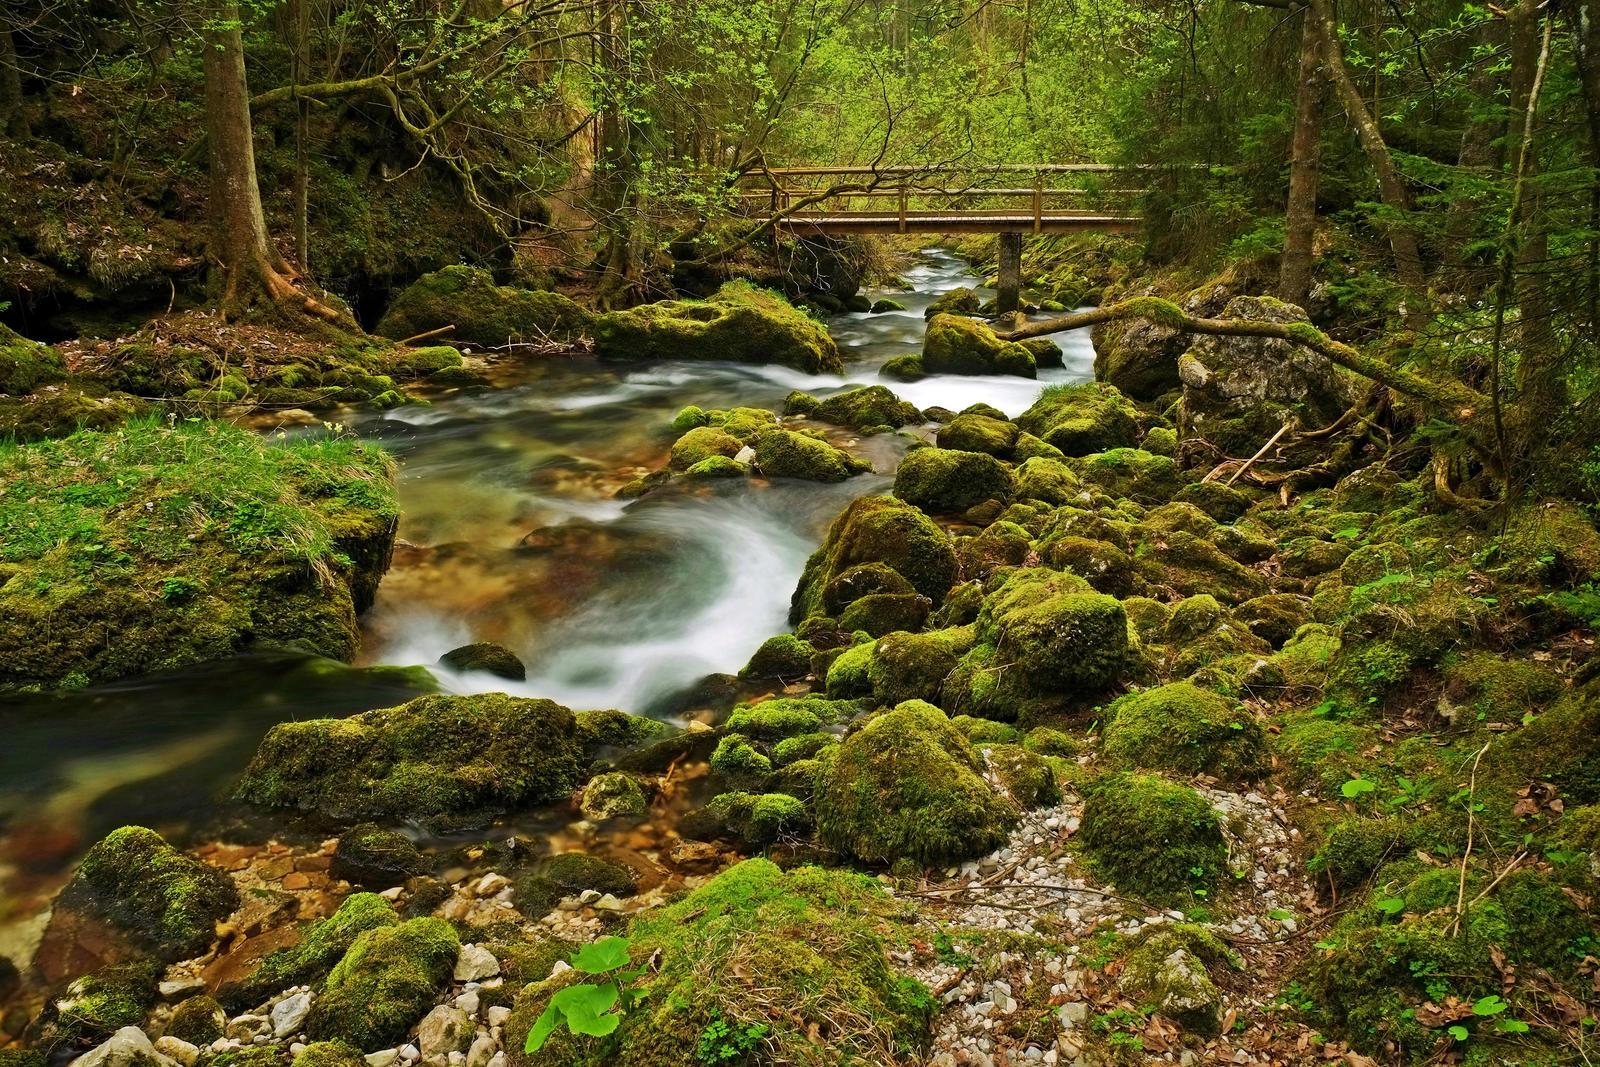 Forest Scene With Bridge by Burtn Forest Scene With Bridge by Burtn